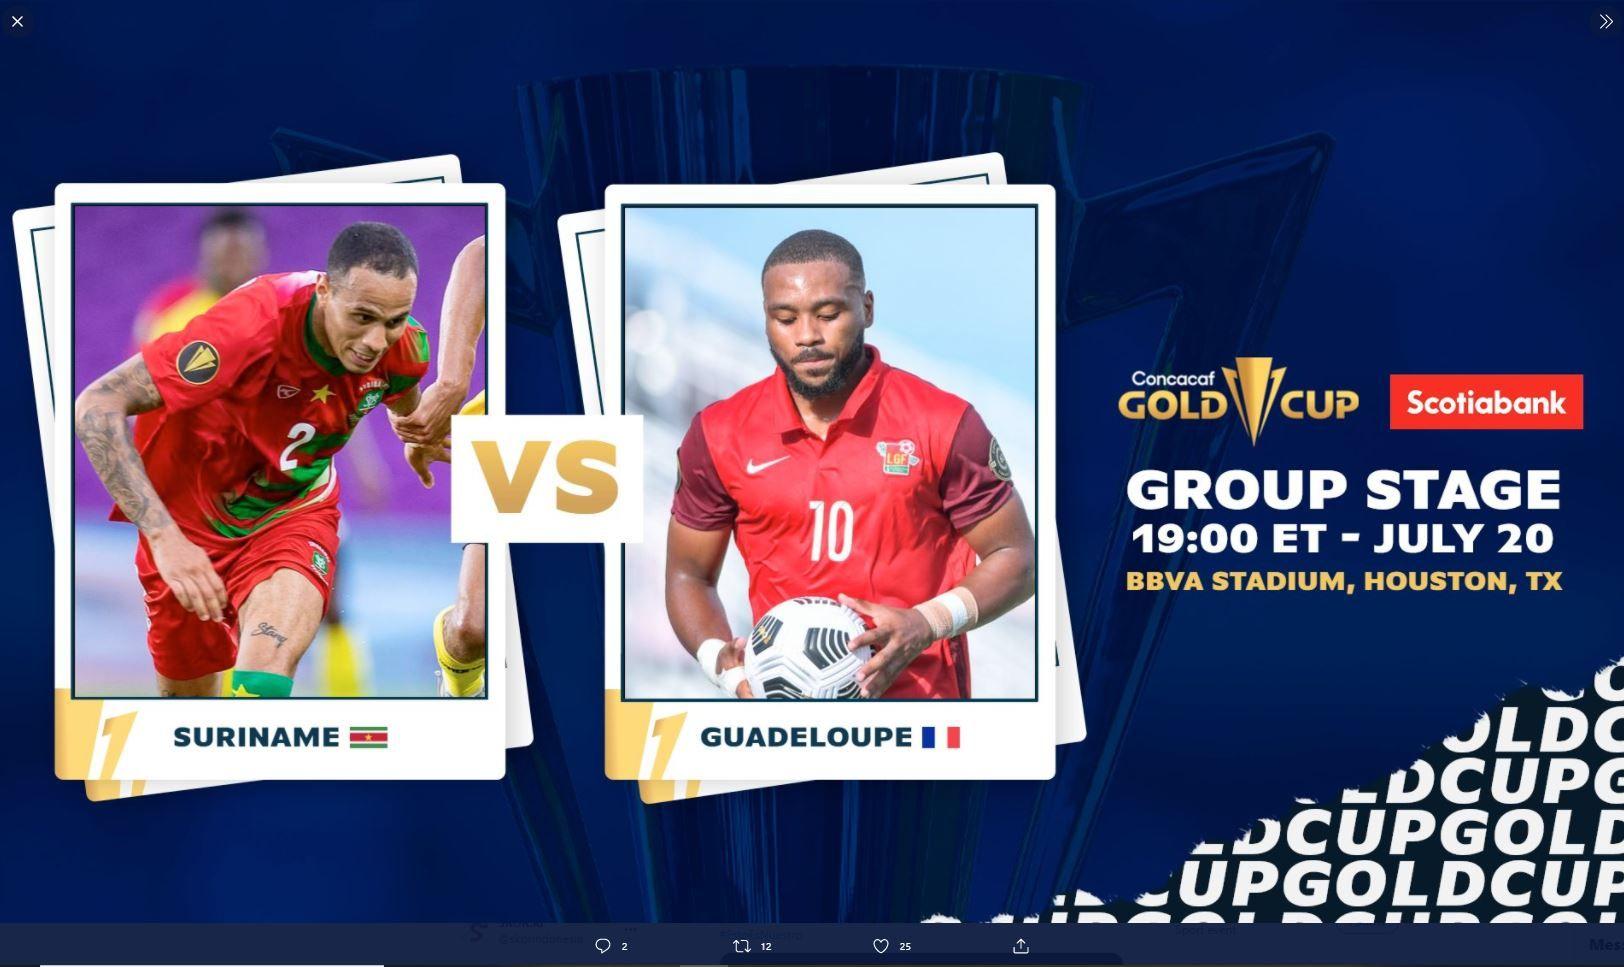 Cover laga Suriname  vs Guadeloupe di Piala Emas CONCACAF 2021.